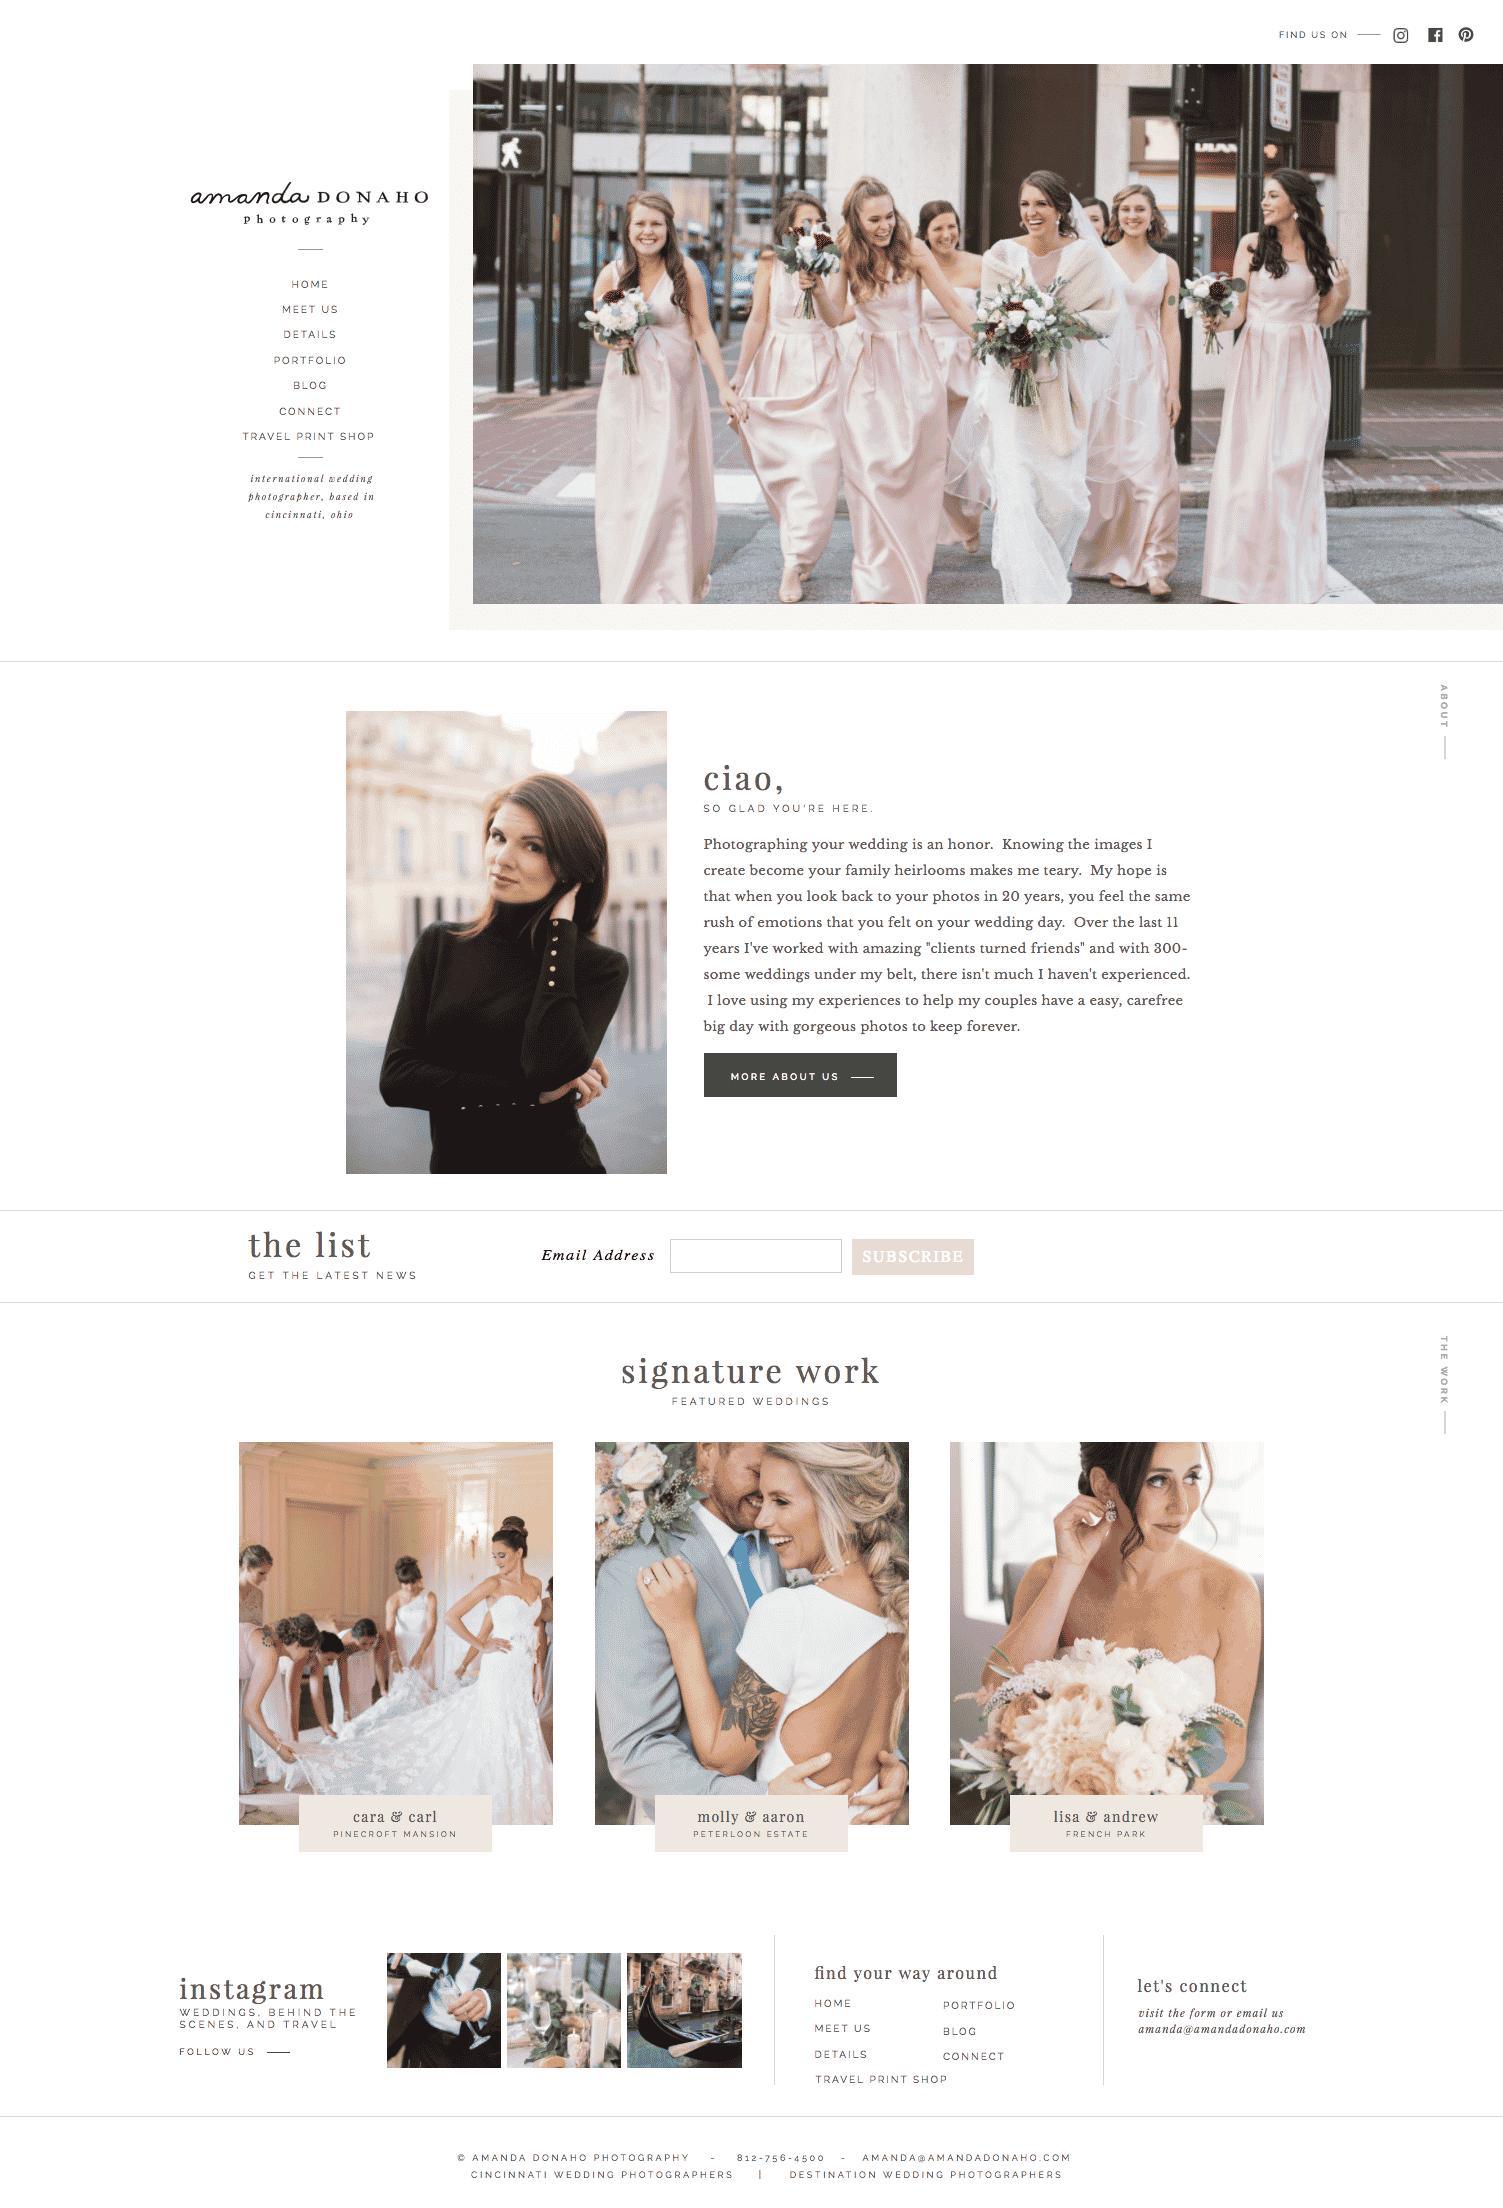 Showit website templates for photographers & creatives | Davey & Krista